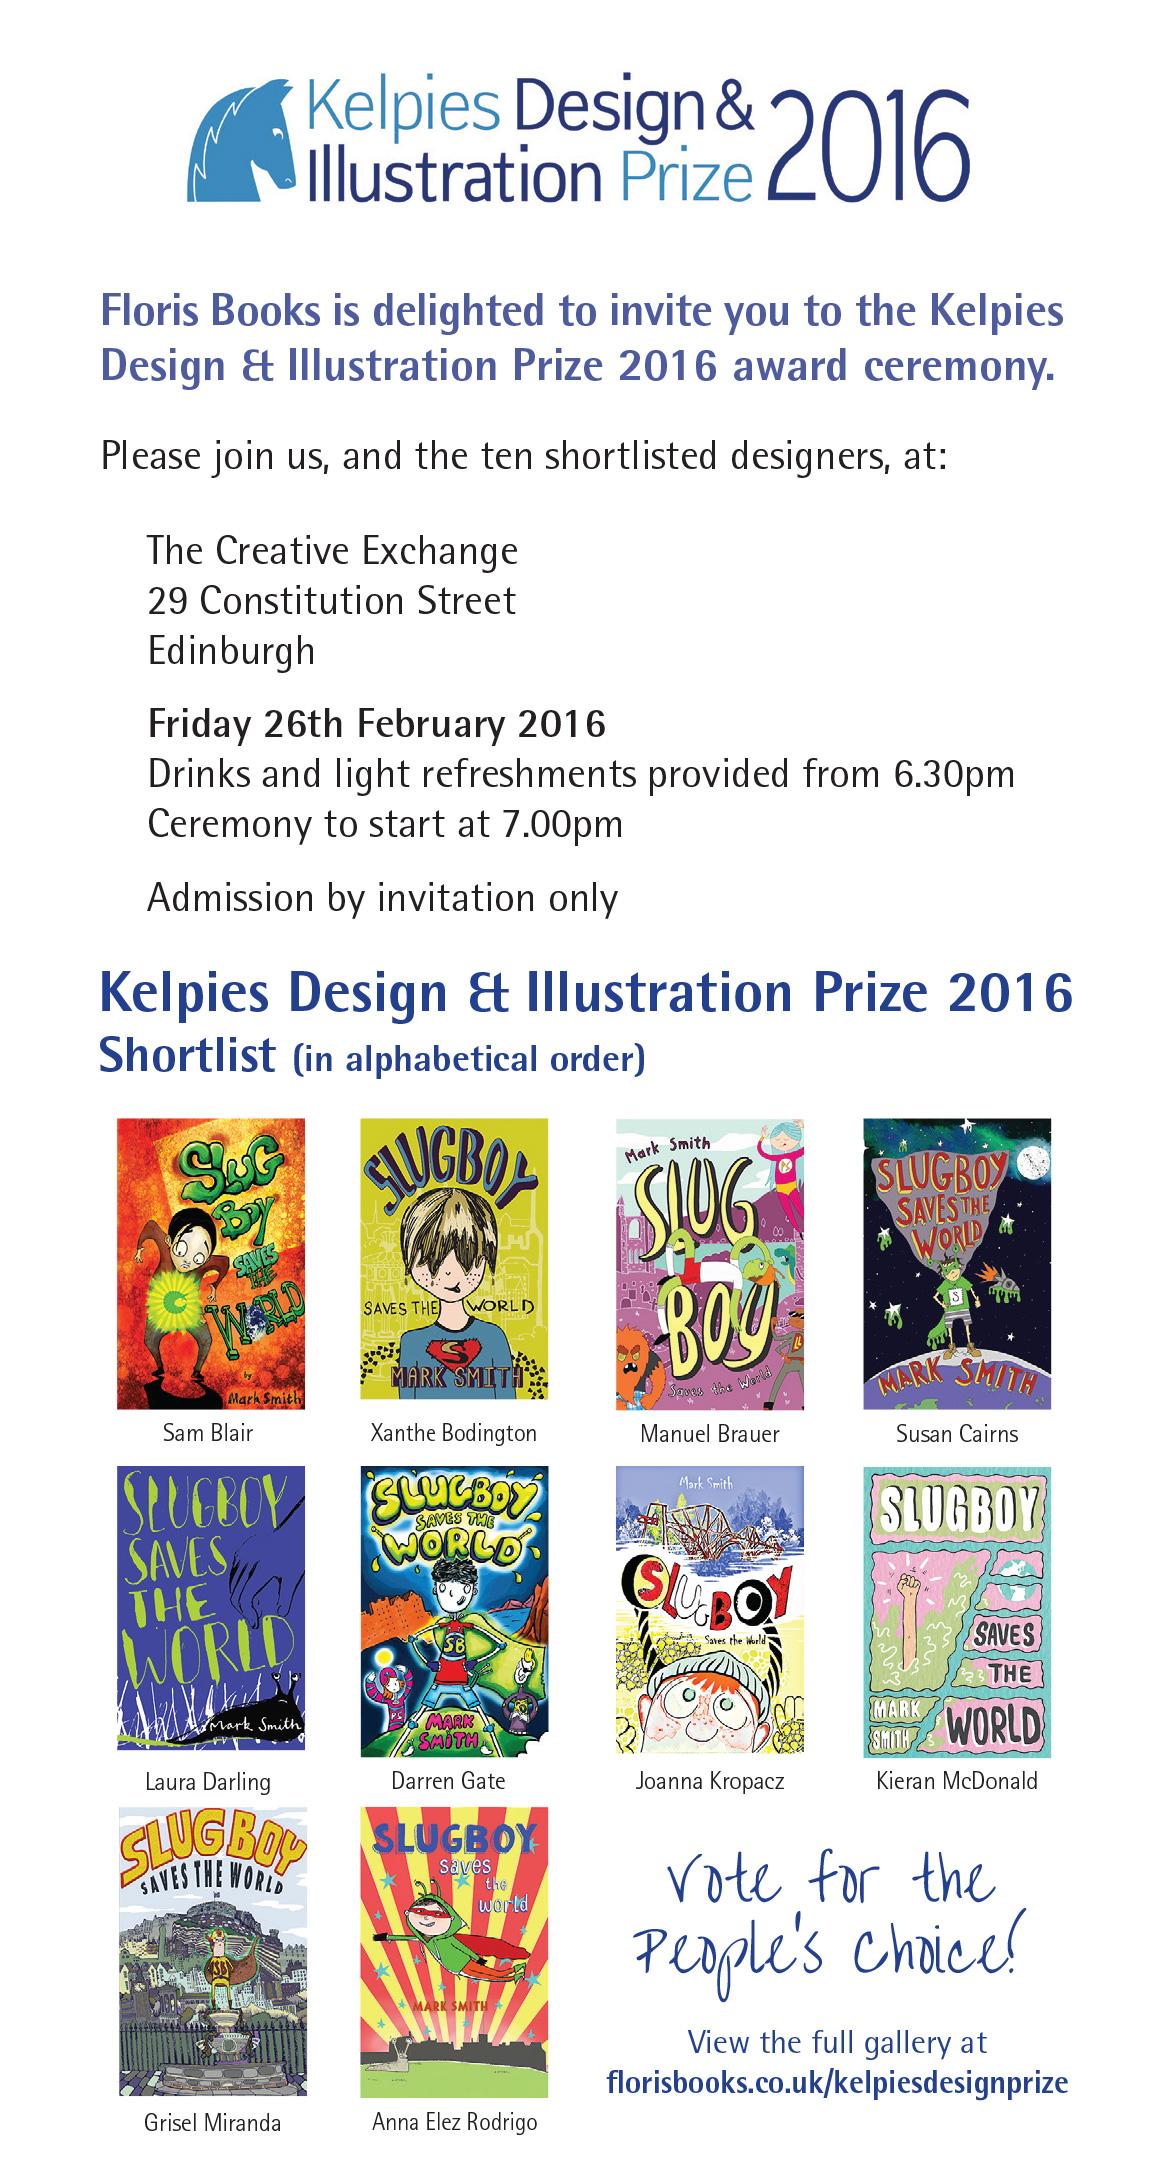 Kelpies Design and Illustration Prize 2016